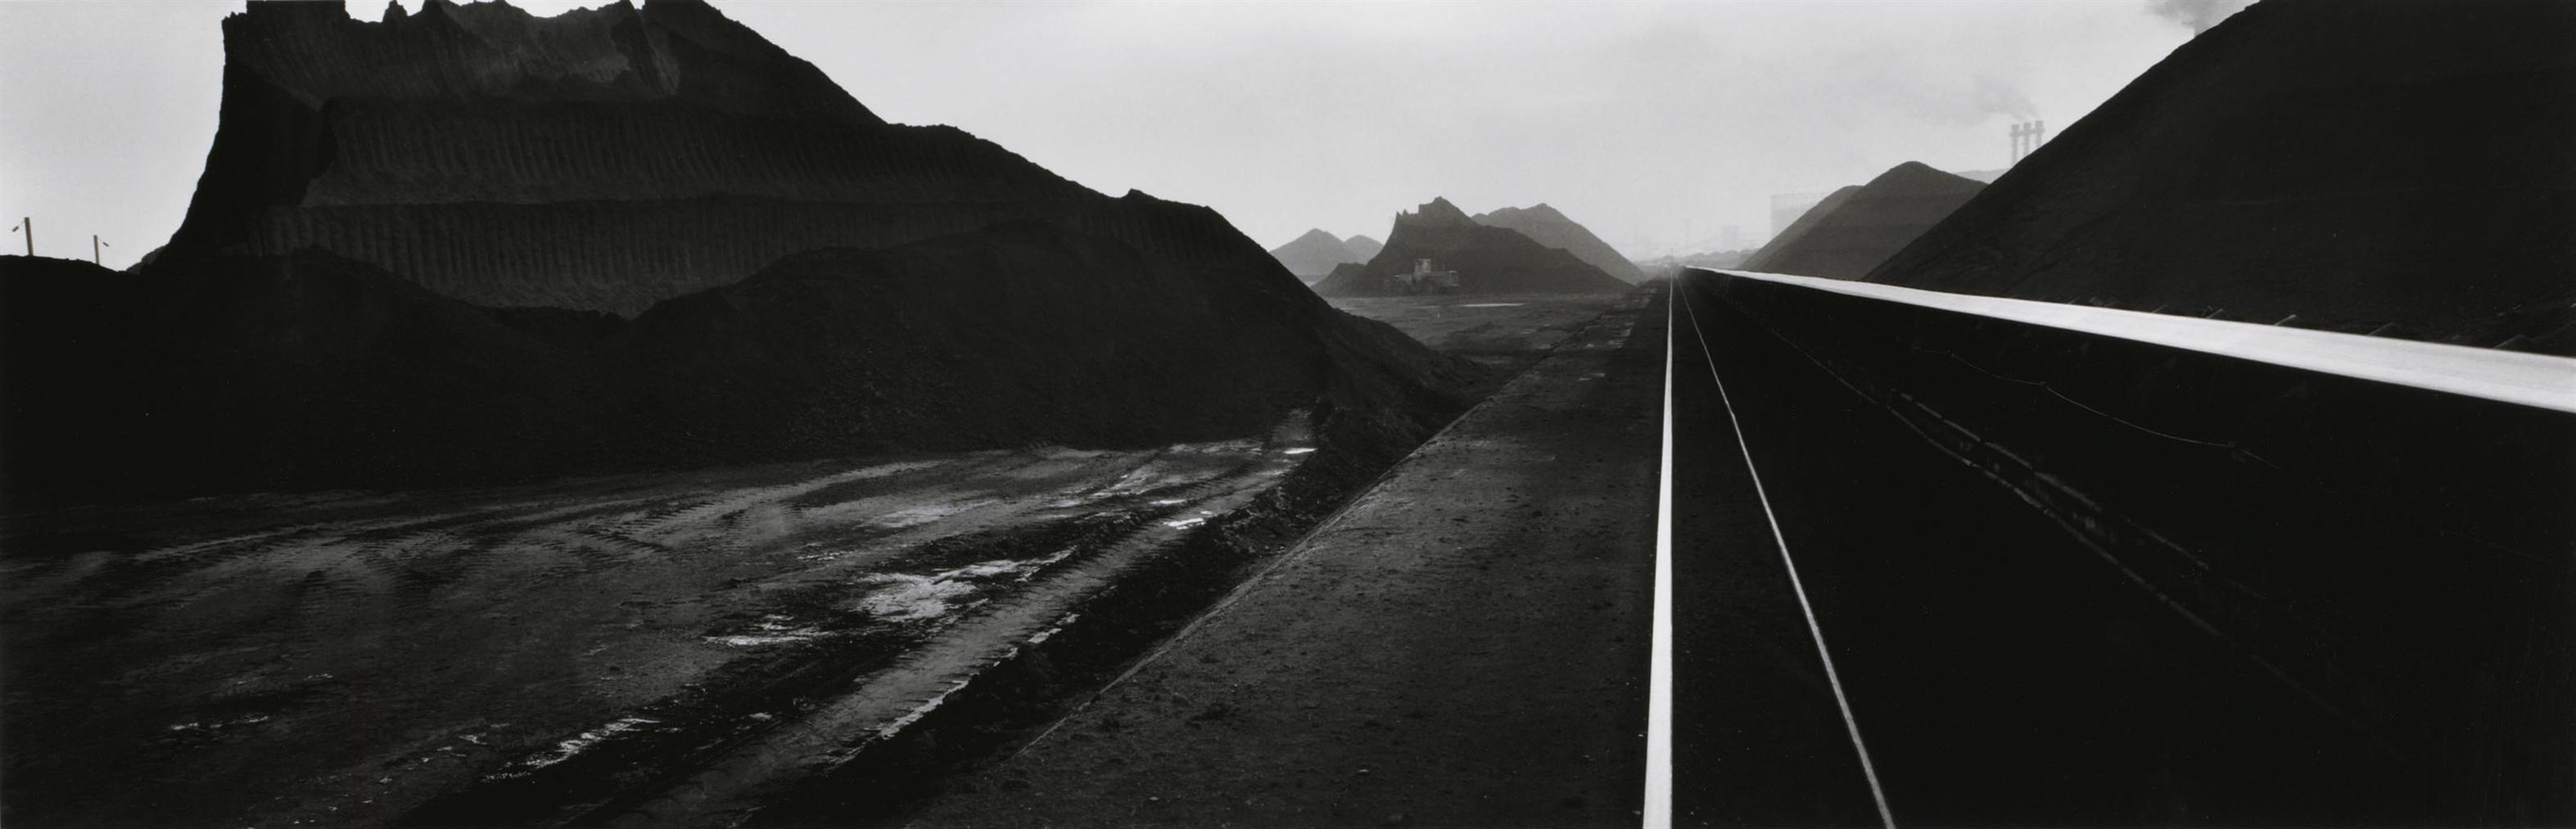 Josef Koudelka-Parc A Charbon - Perspectives-1987